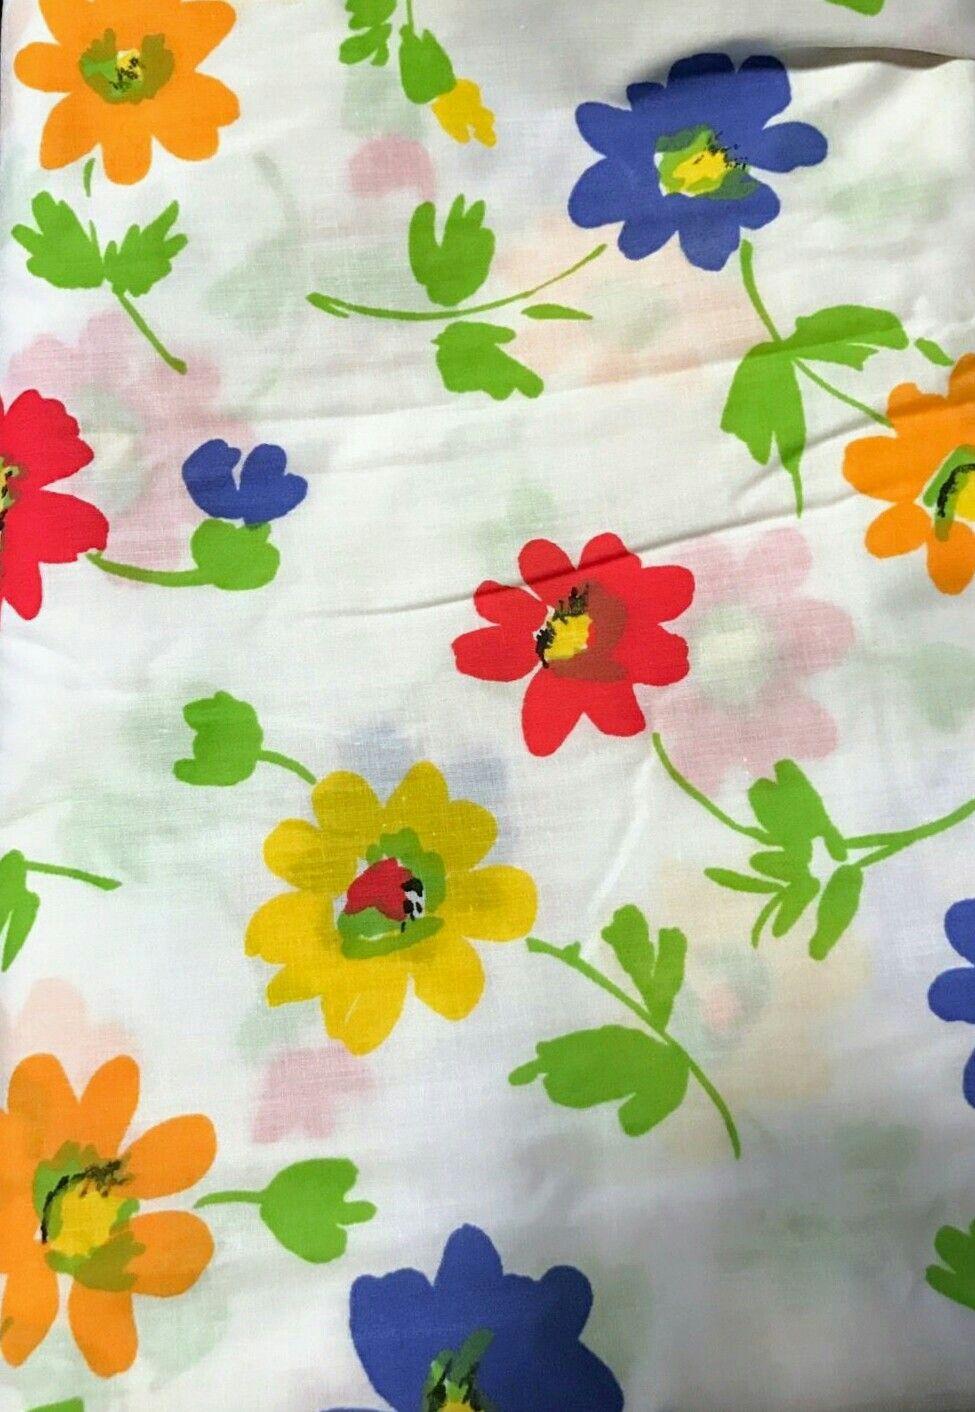 Vintage Pequot U0027Field Flowersu0027 Pattern Bed Sheets. Mod Floral Print On  White Background.